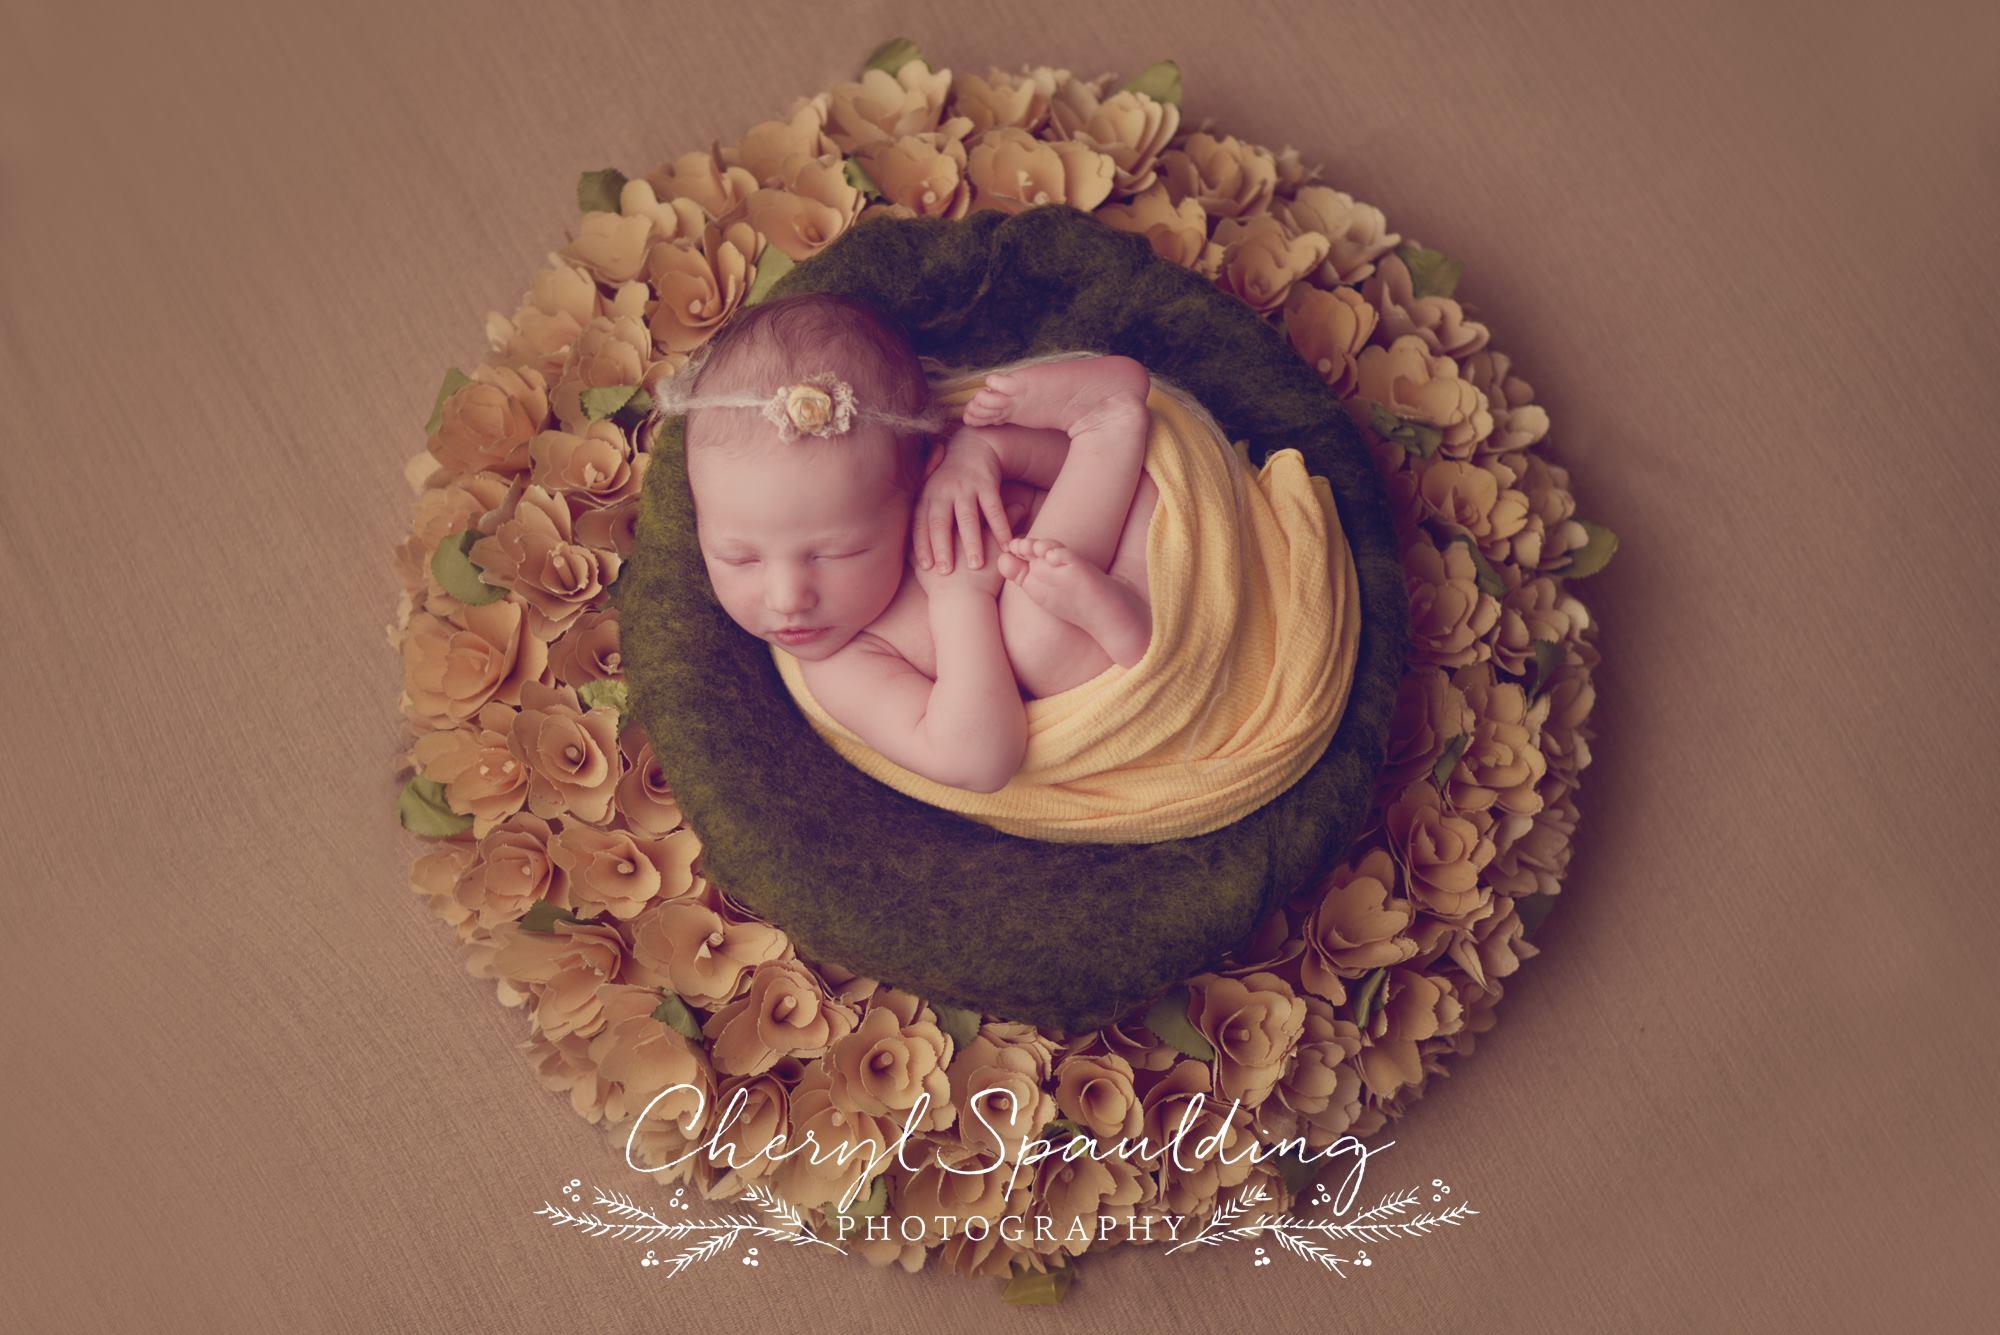 Cheryl-Spaulding-Photography-2